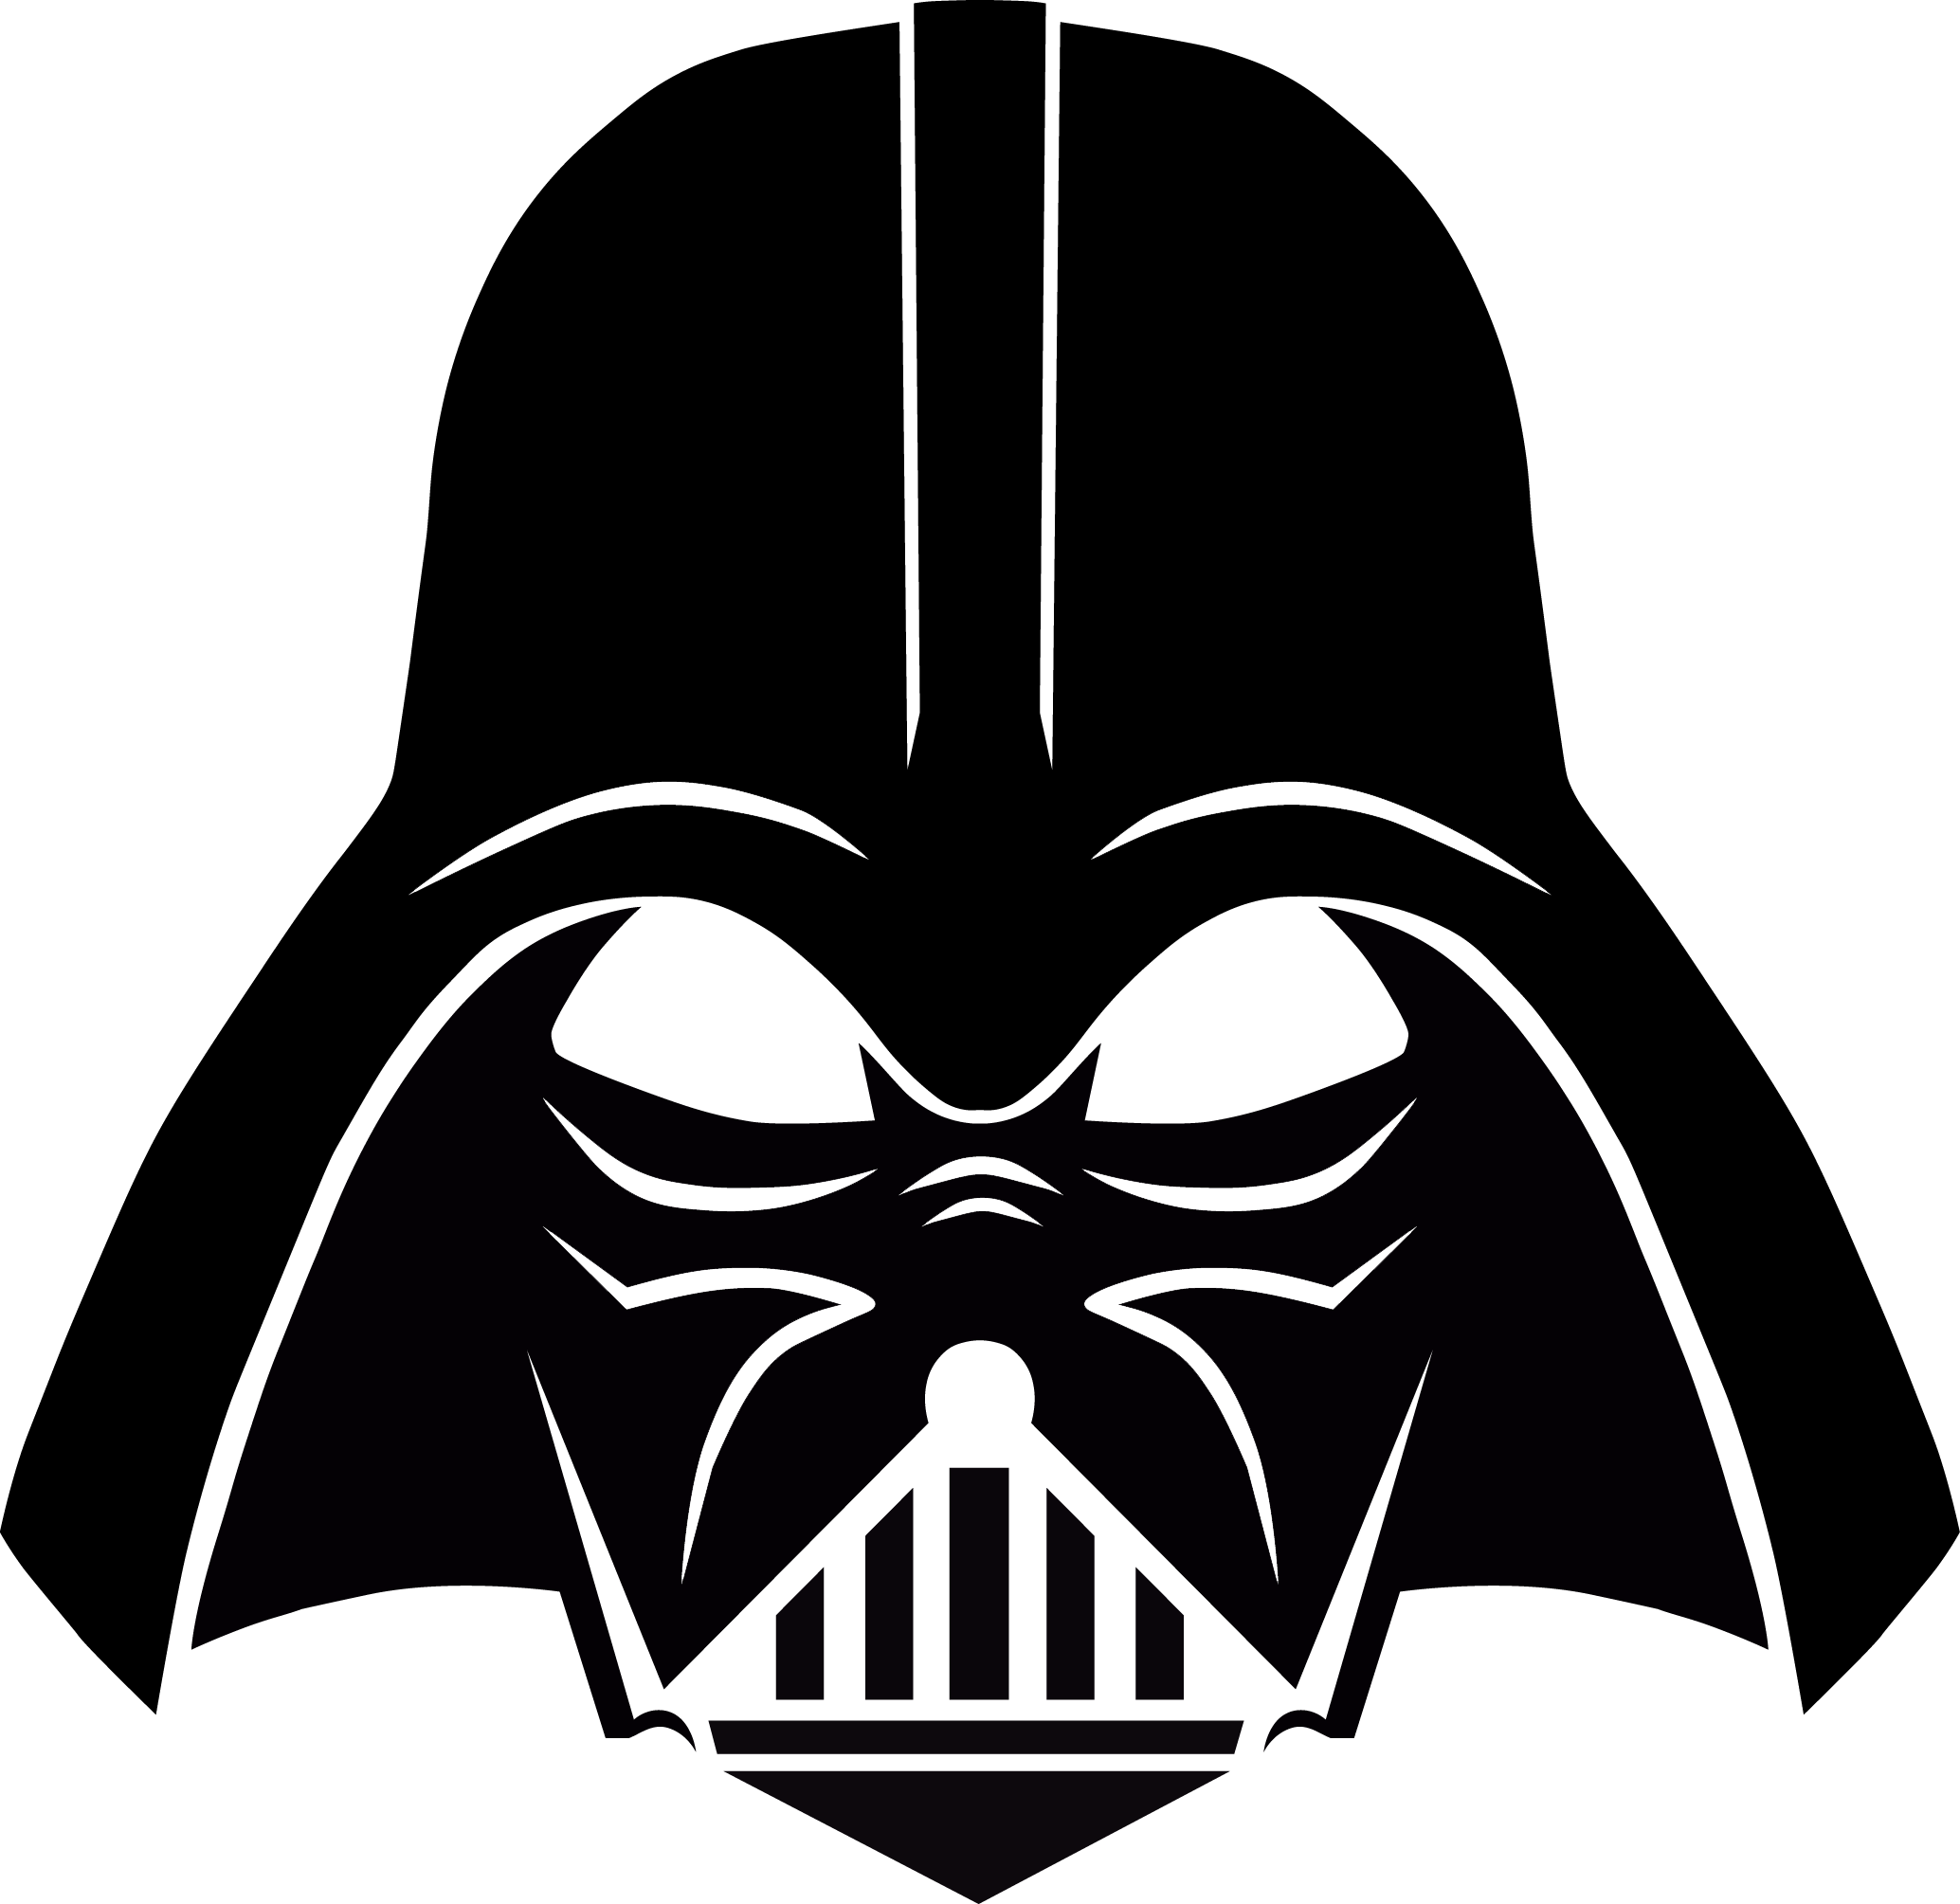 Darth Vader PNG Image - PurePNG | Free transparent CC0 PNG ...